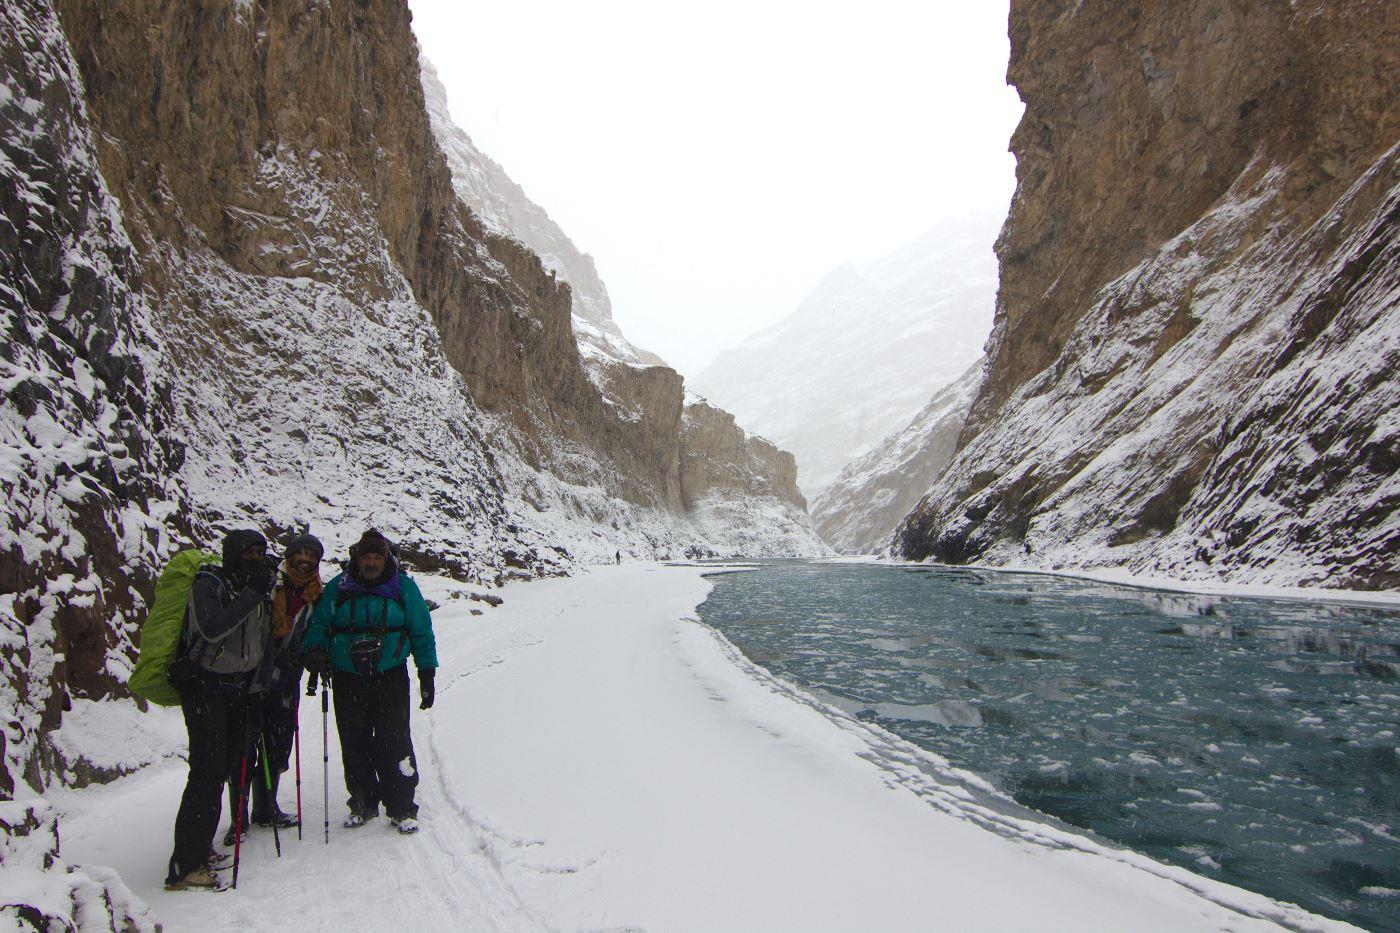 Seri - Frozen Lake Treks | Utter Bewakoof